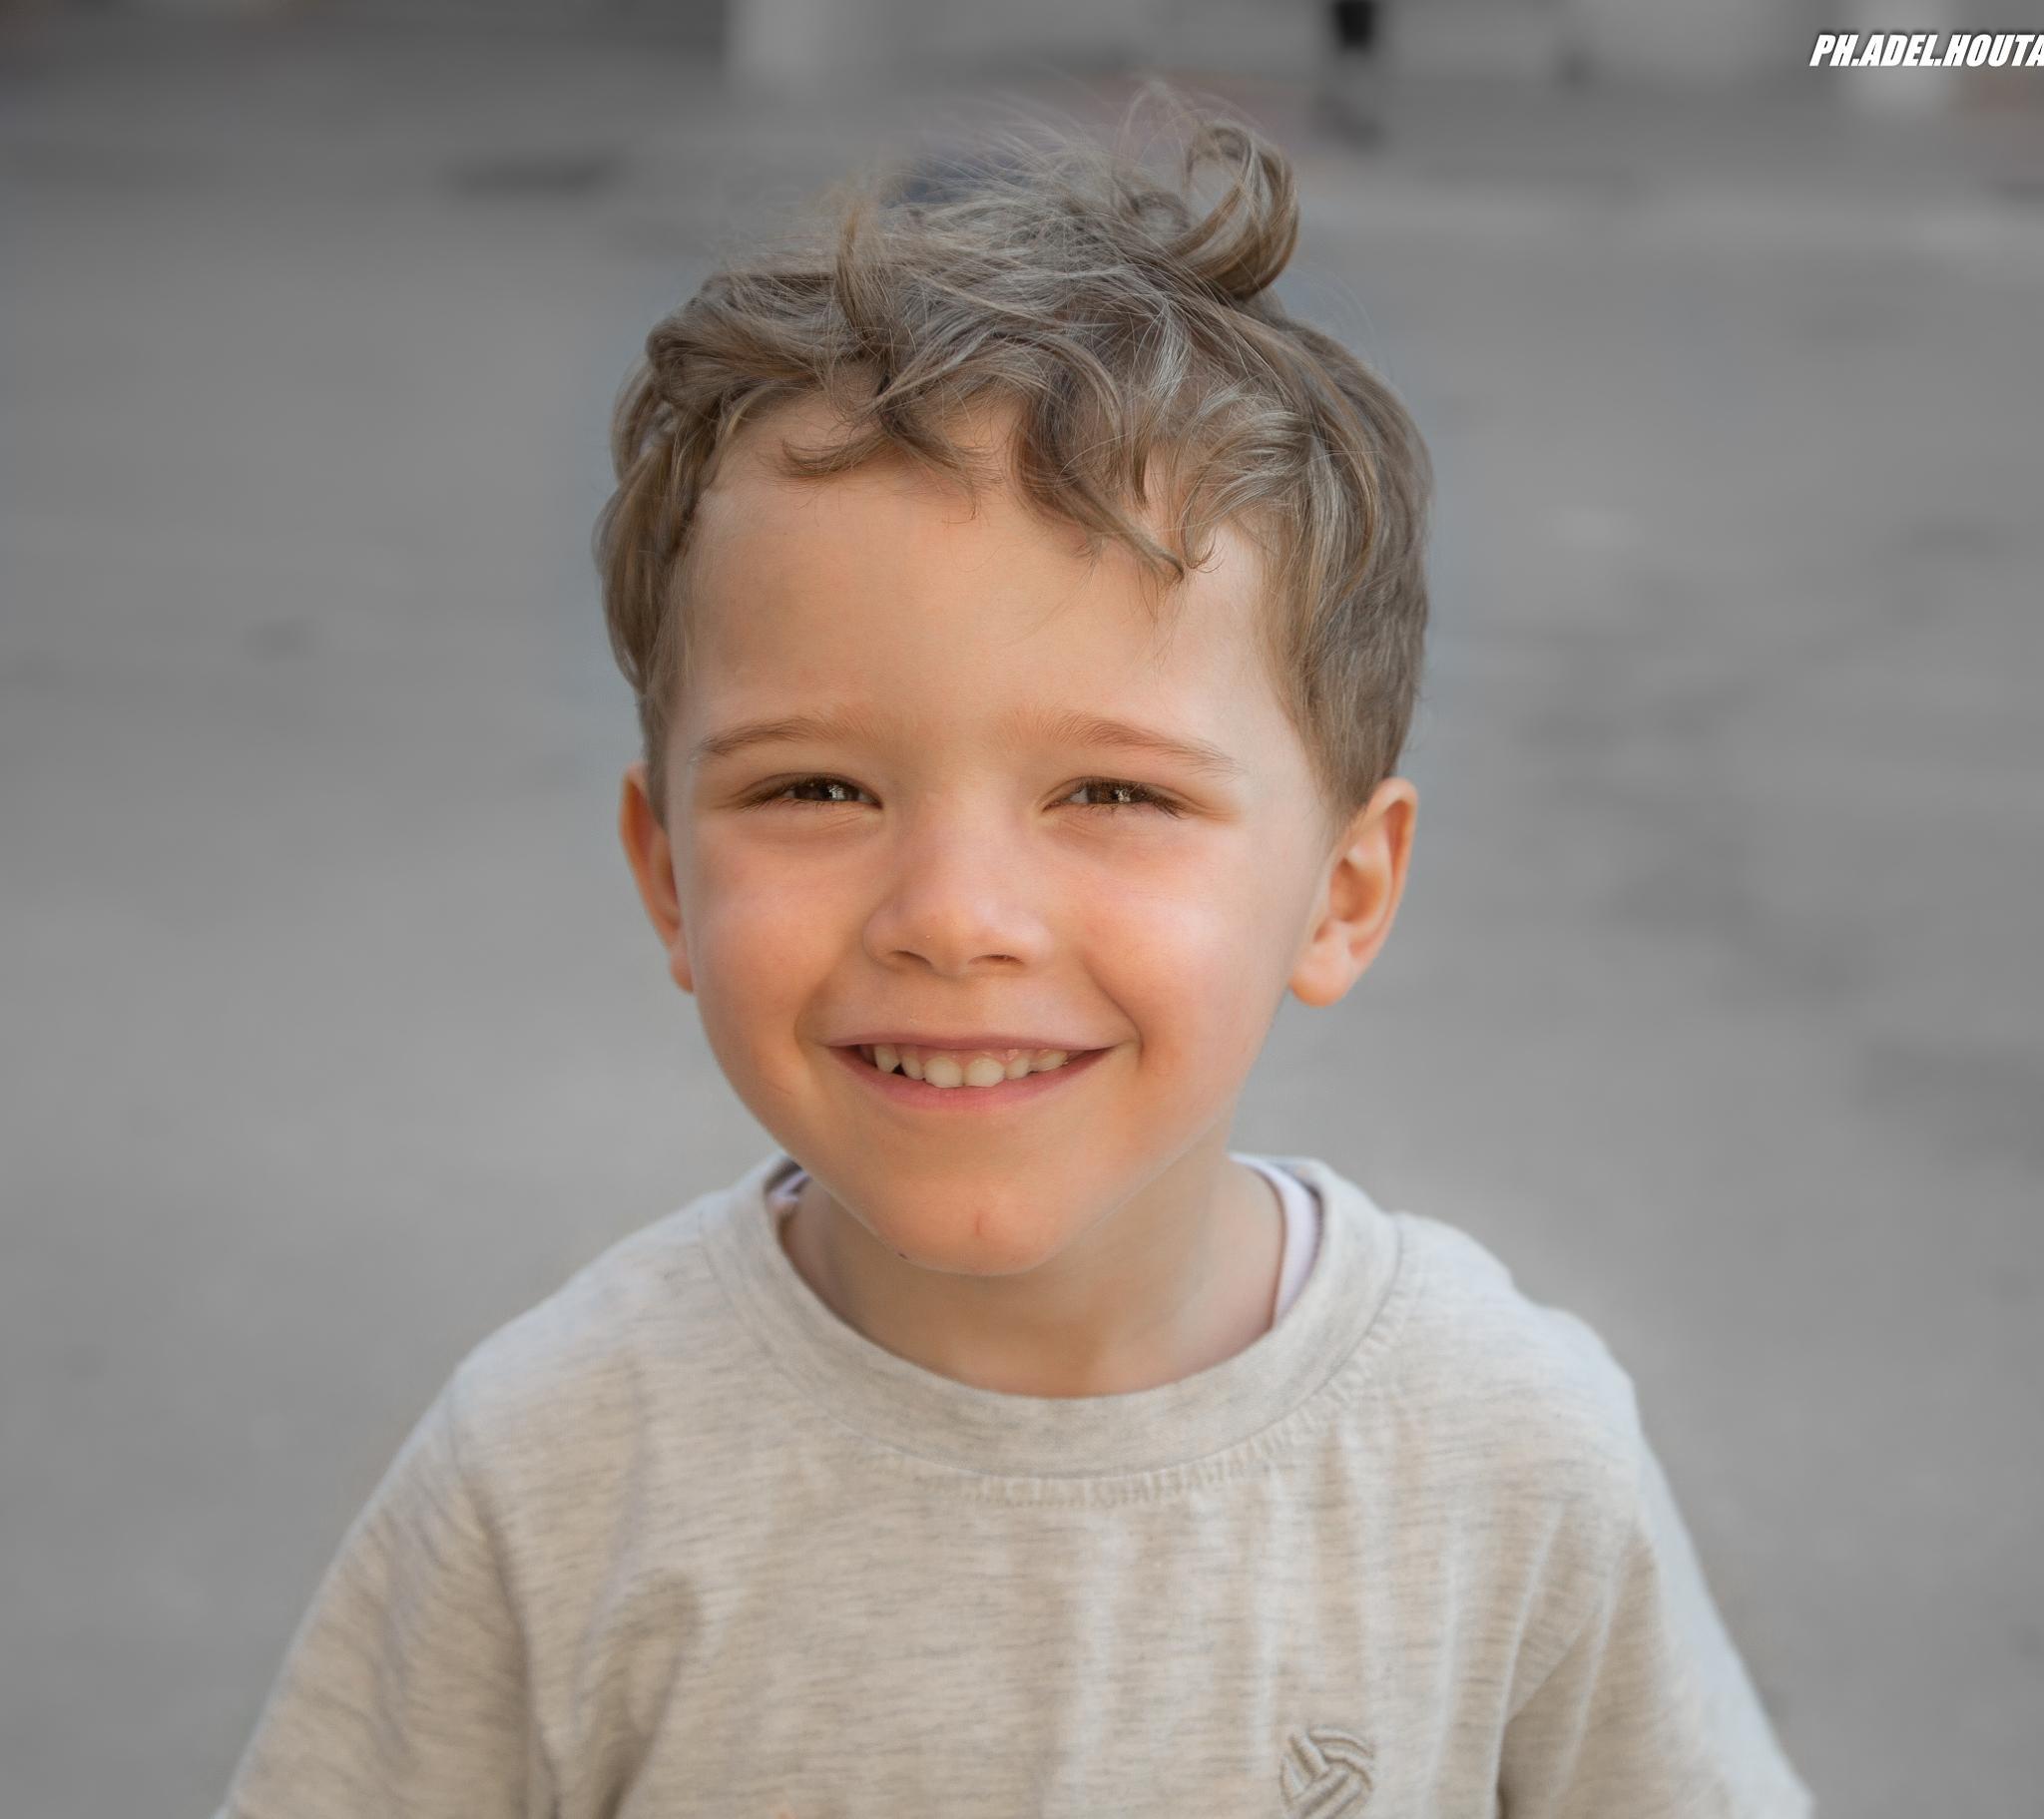 handsome boy by adelhouta